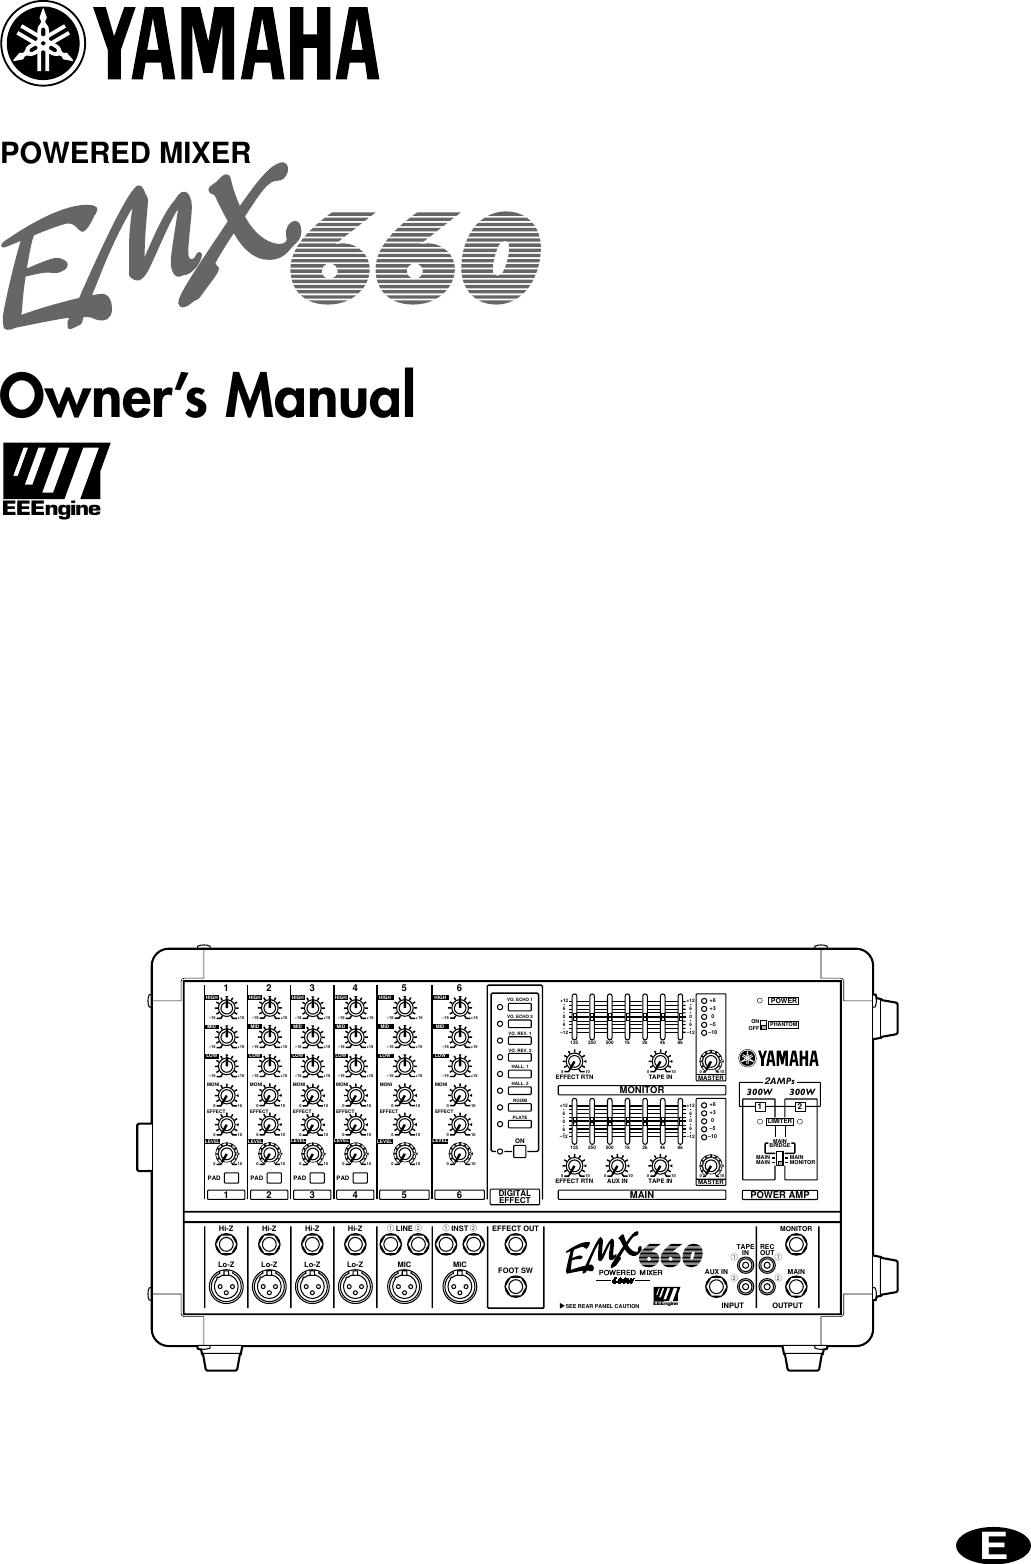 Bestseller: Yamaha Emx 660 Manual